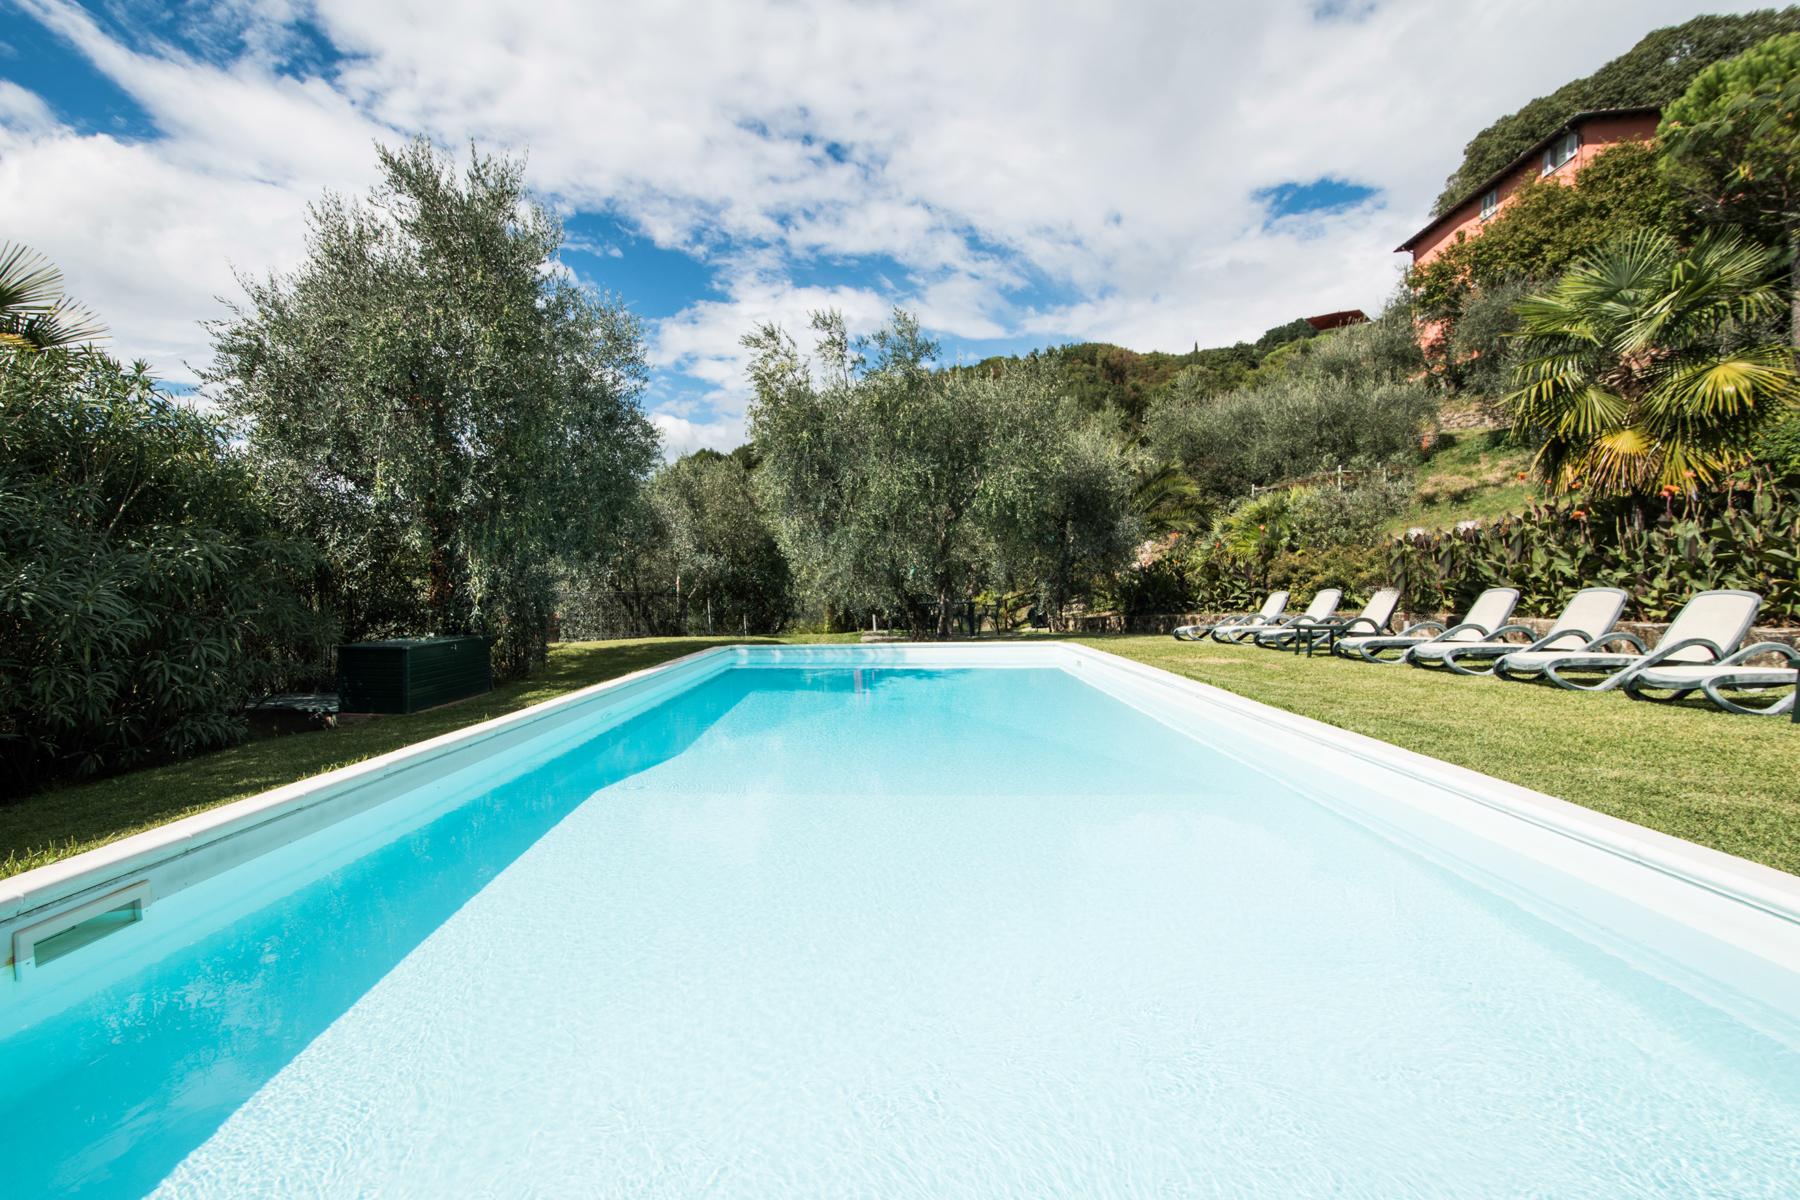 Villa in Vendita a Lucca: 5 locali, 1065 mq - Foto 26